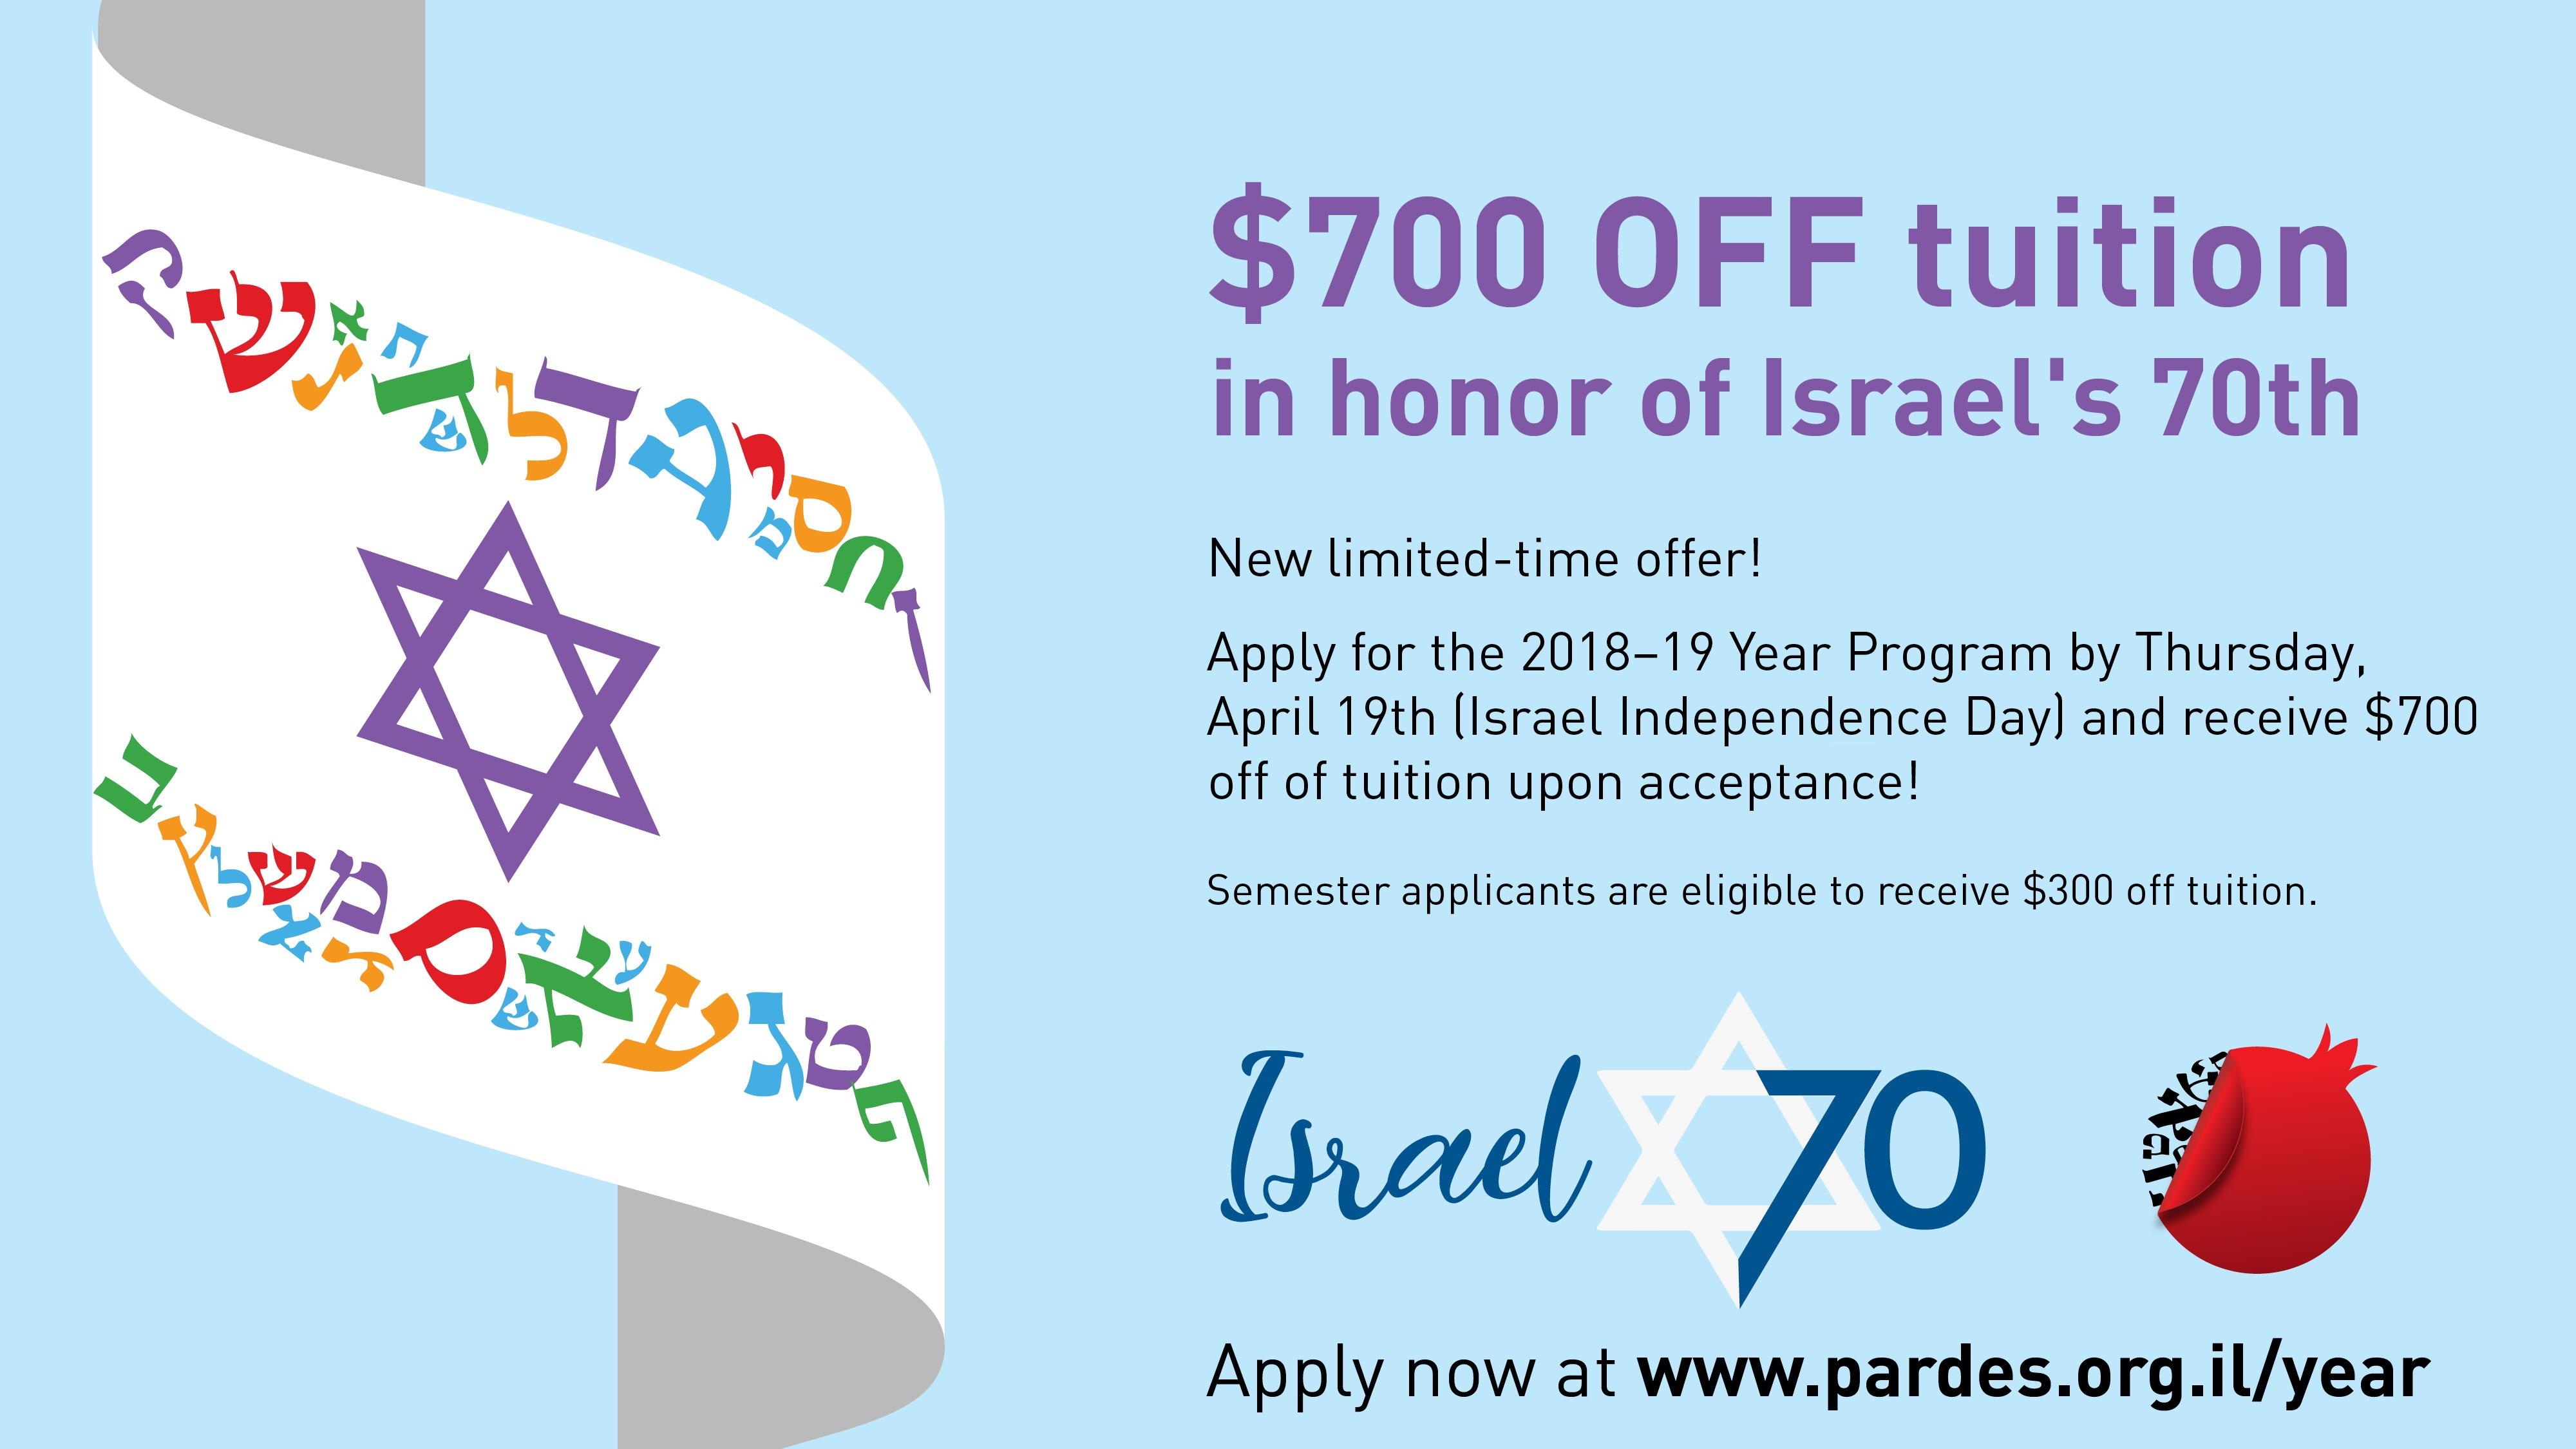 Pardes Institute of Jewish Studies offers scholarship